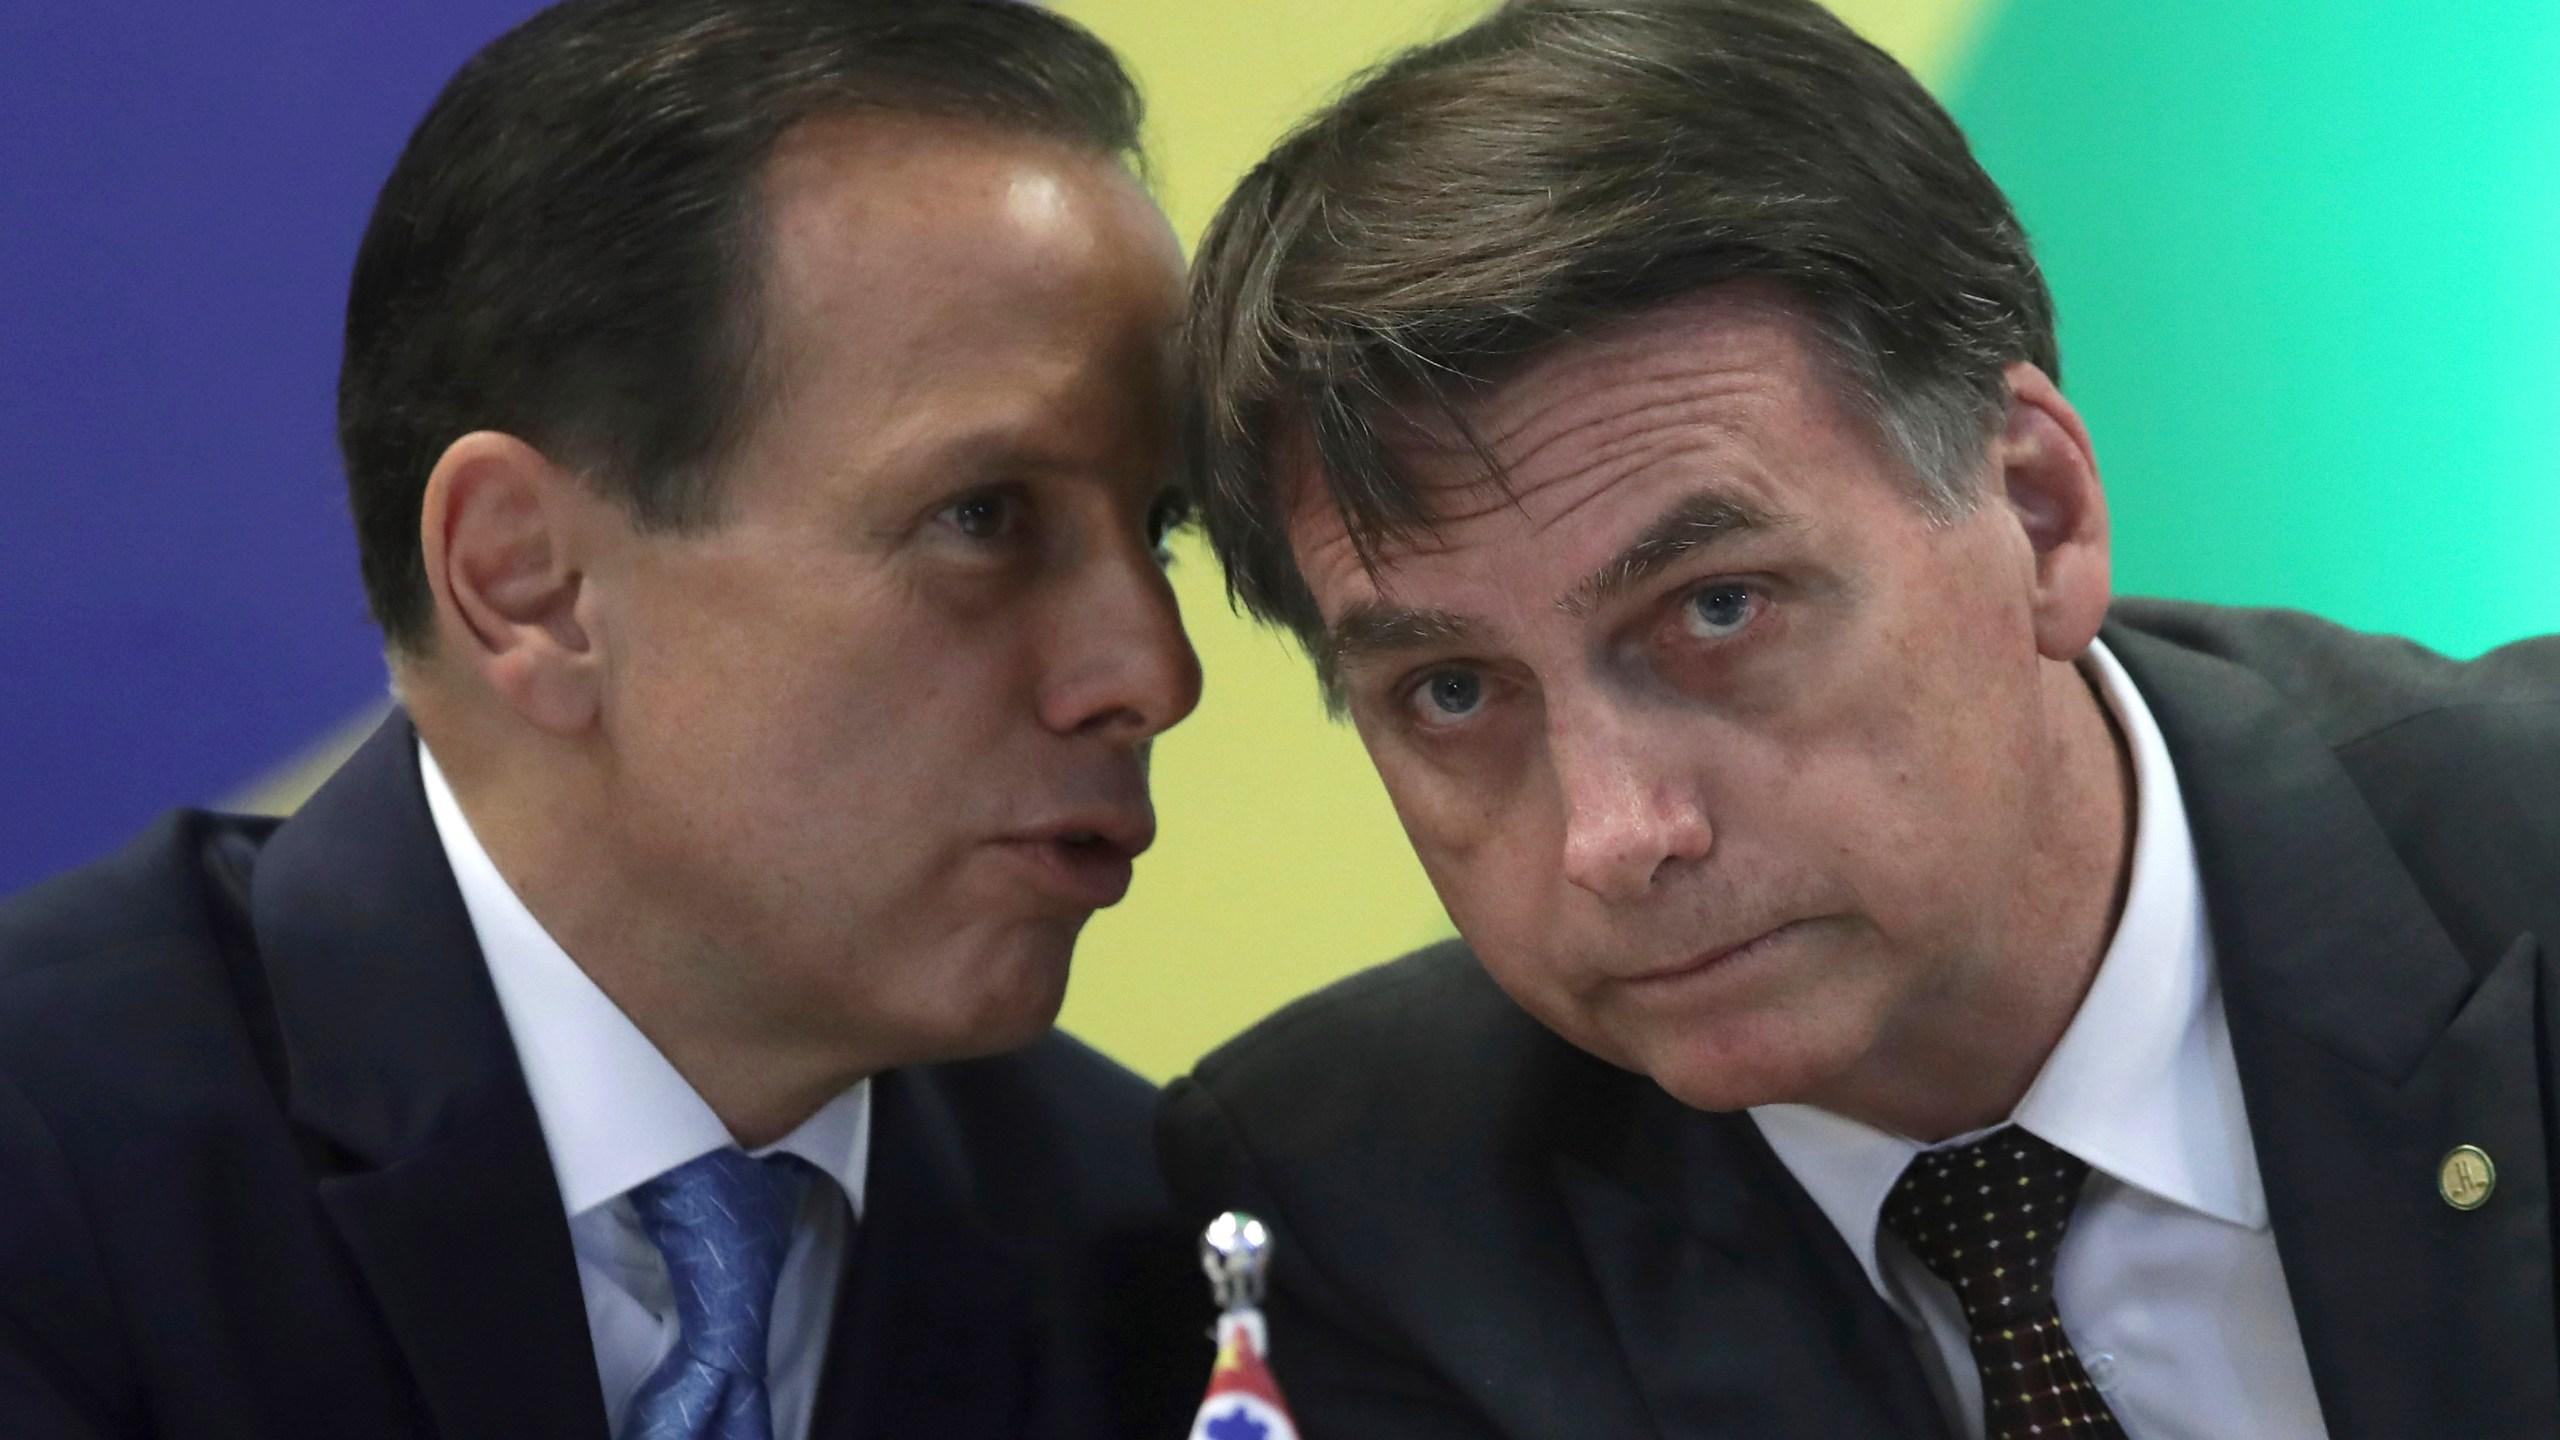 Jair Bolsonaro, Joao Doria